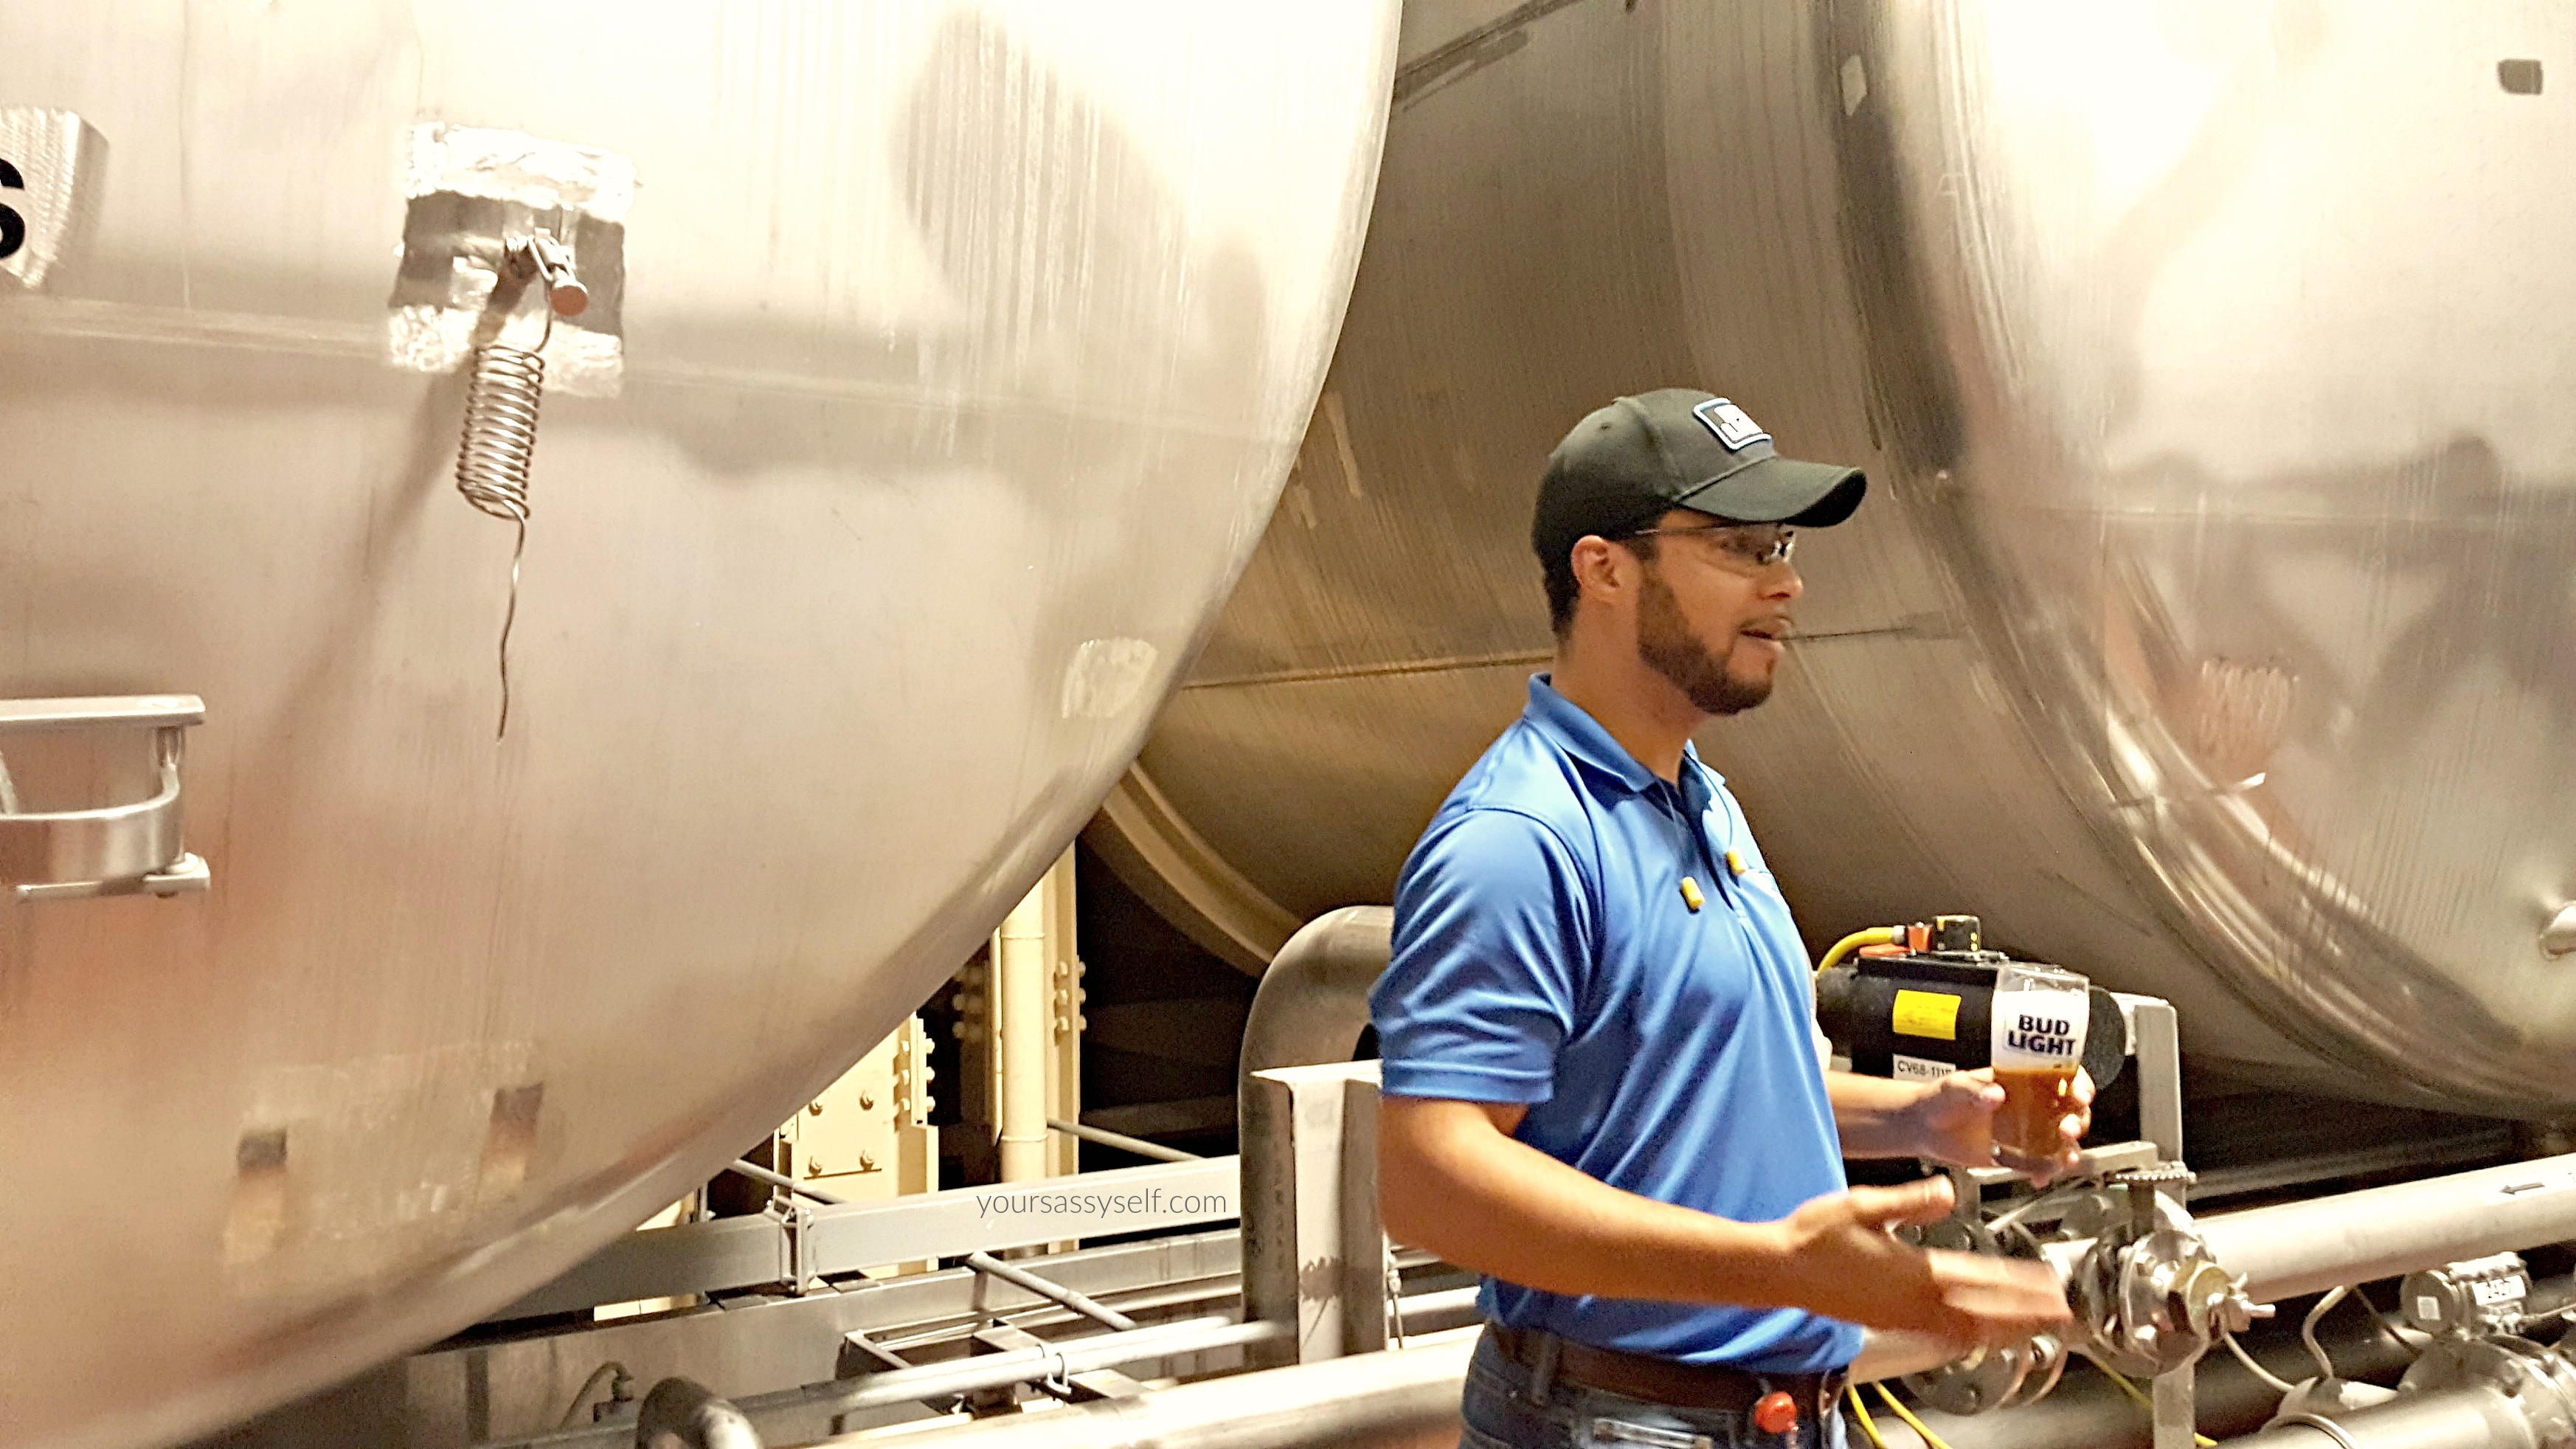 Bud Light Brewmaster Sharing Proper Pour Technique - yoursassyself.com